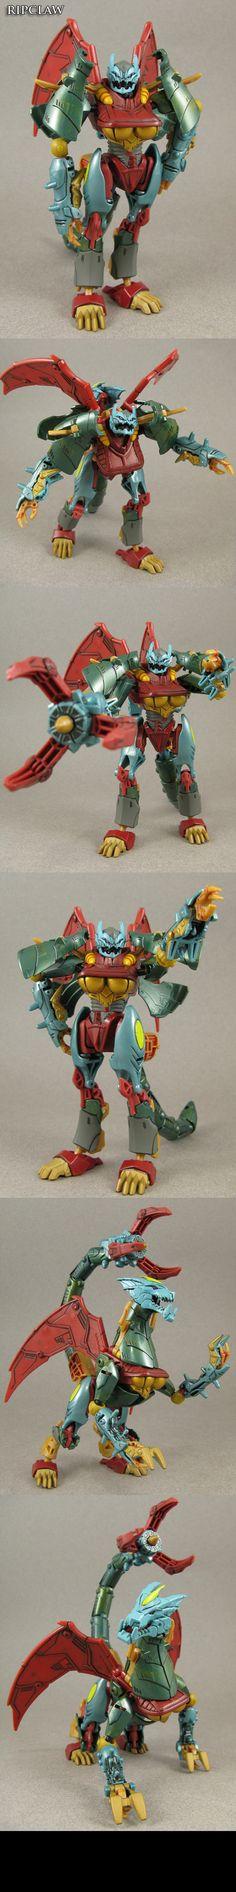 Transformers Beast Hunters custom Ripclaw by Jin-Saotome.deviantart.com on @deviantART